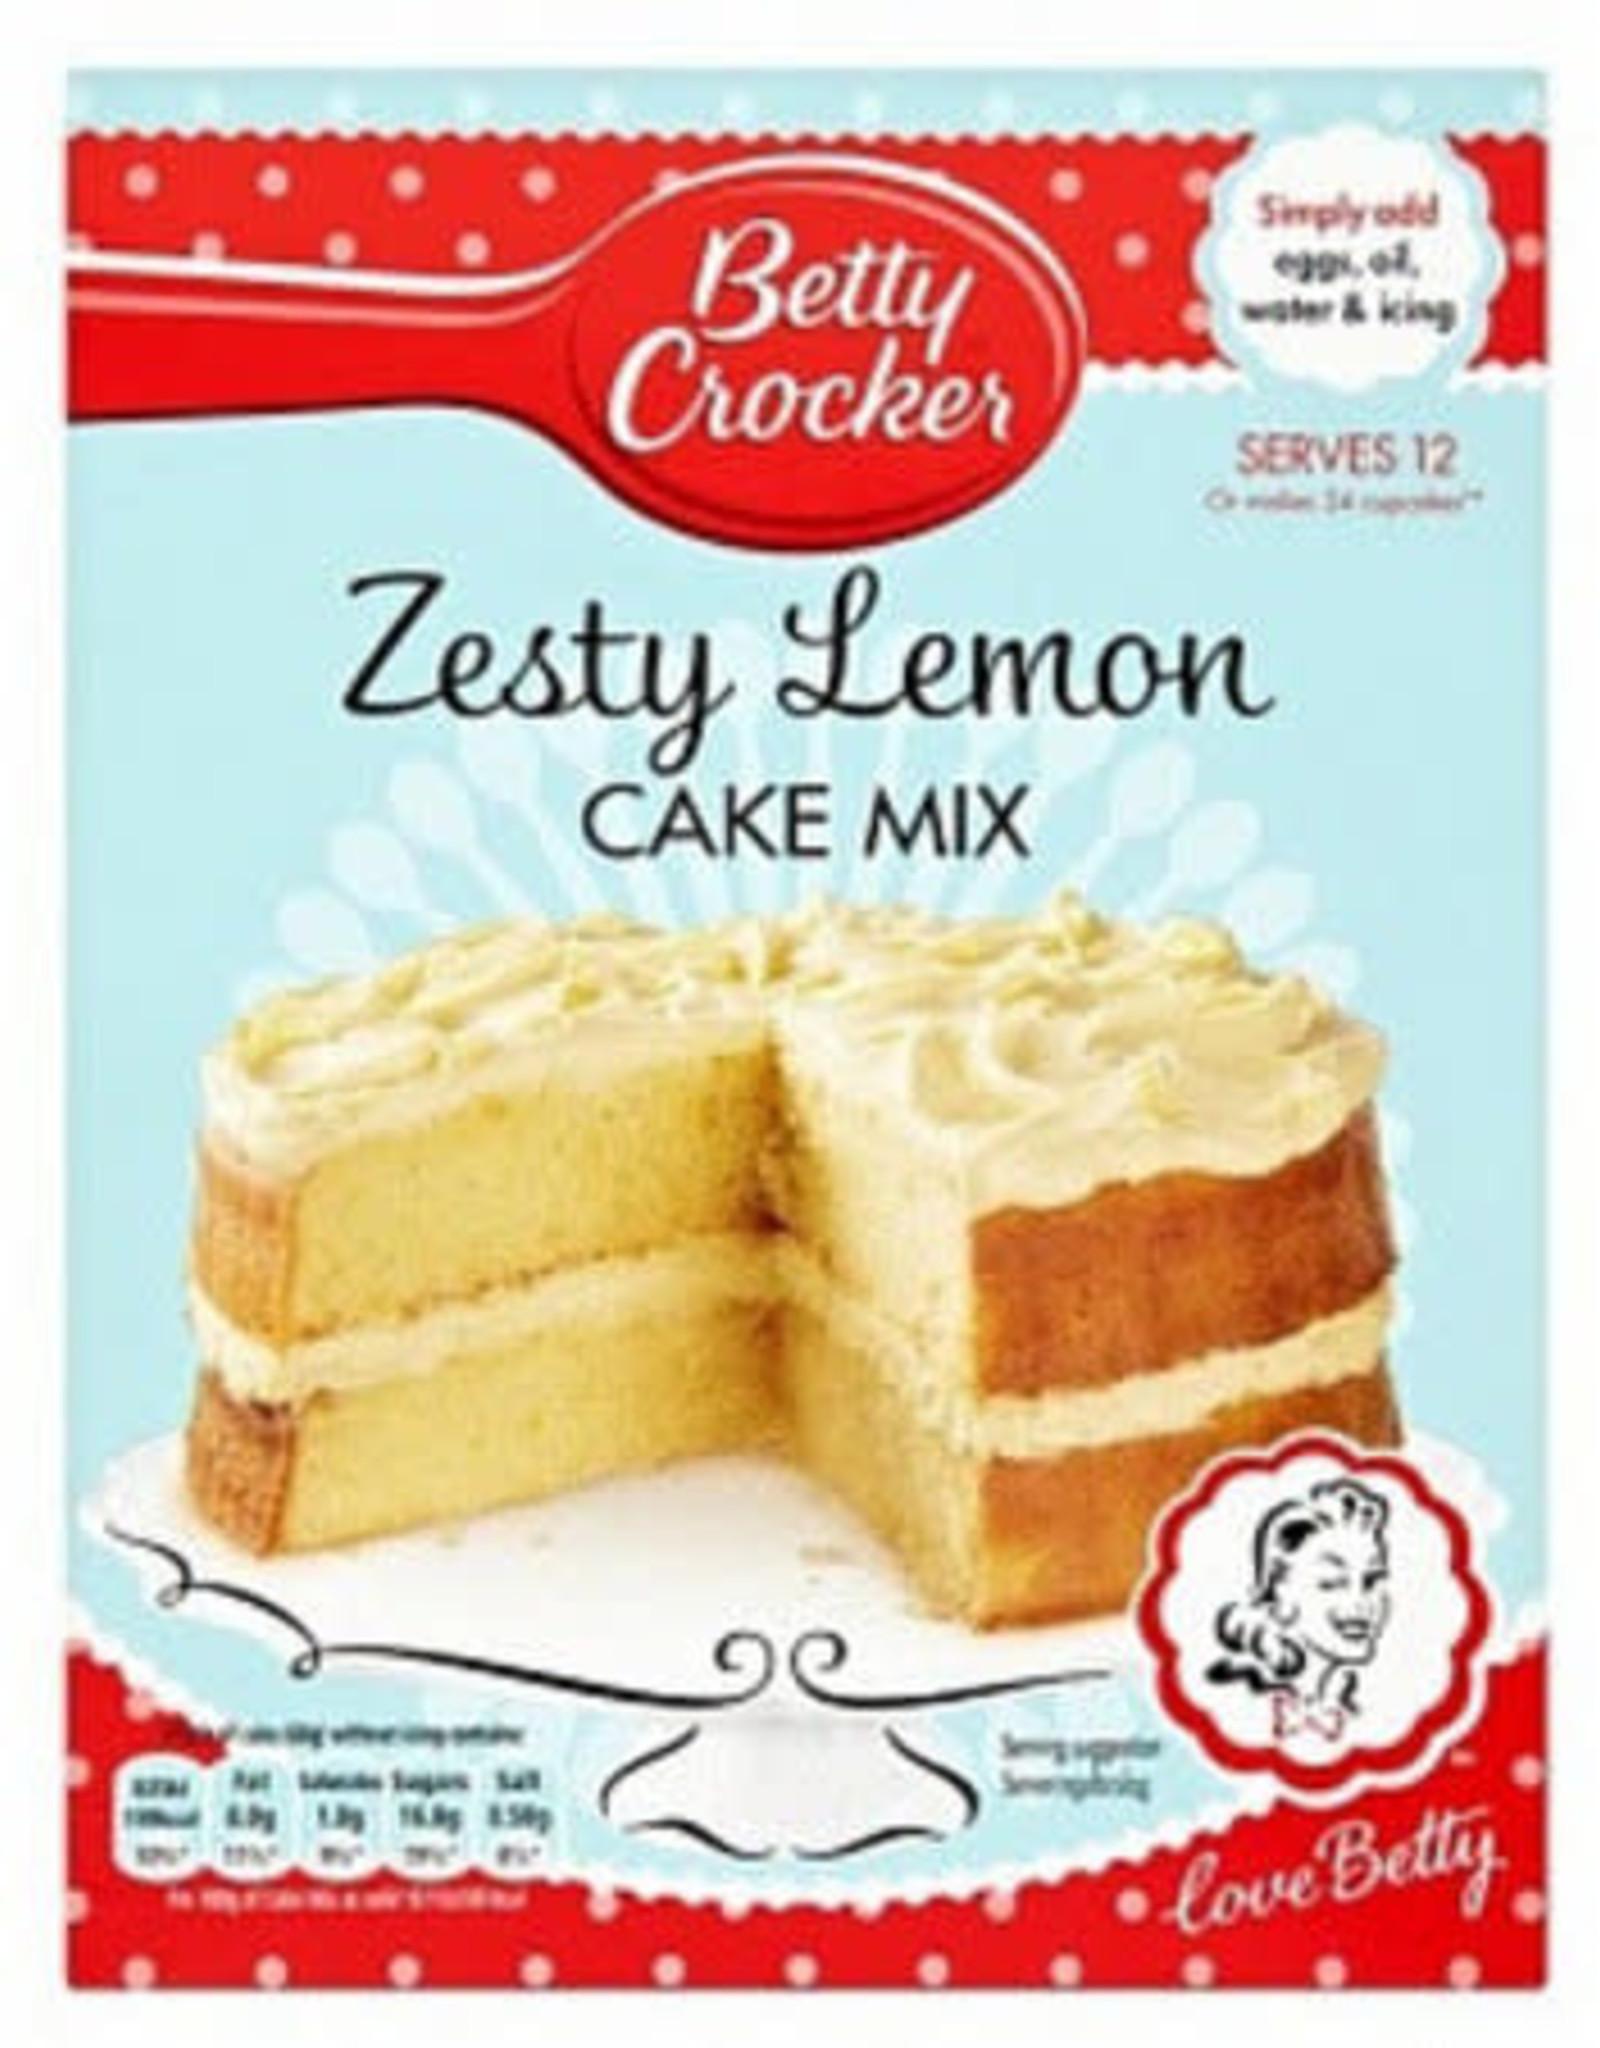 Betty Crocker Betty Crocker Zesty Lemon Cake Mix